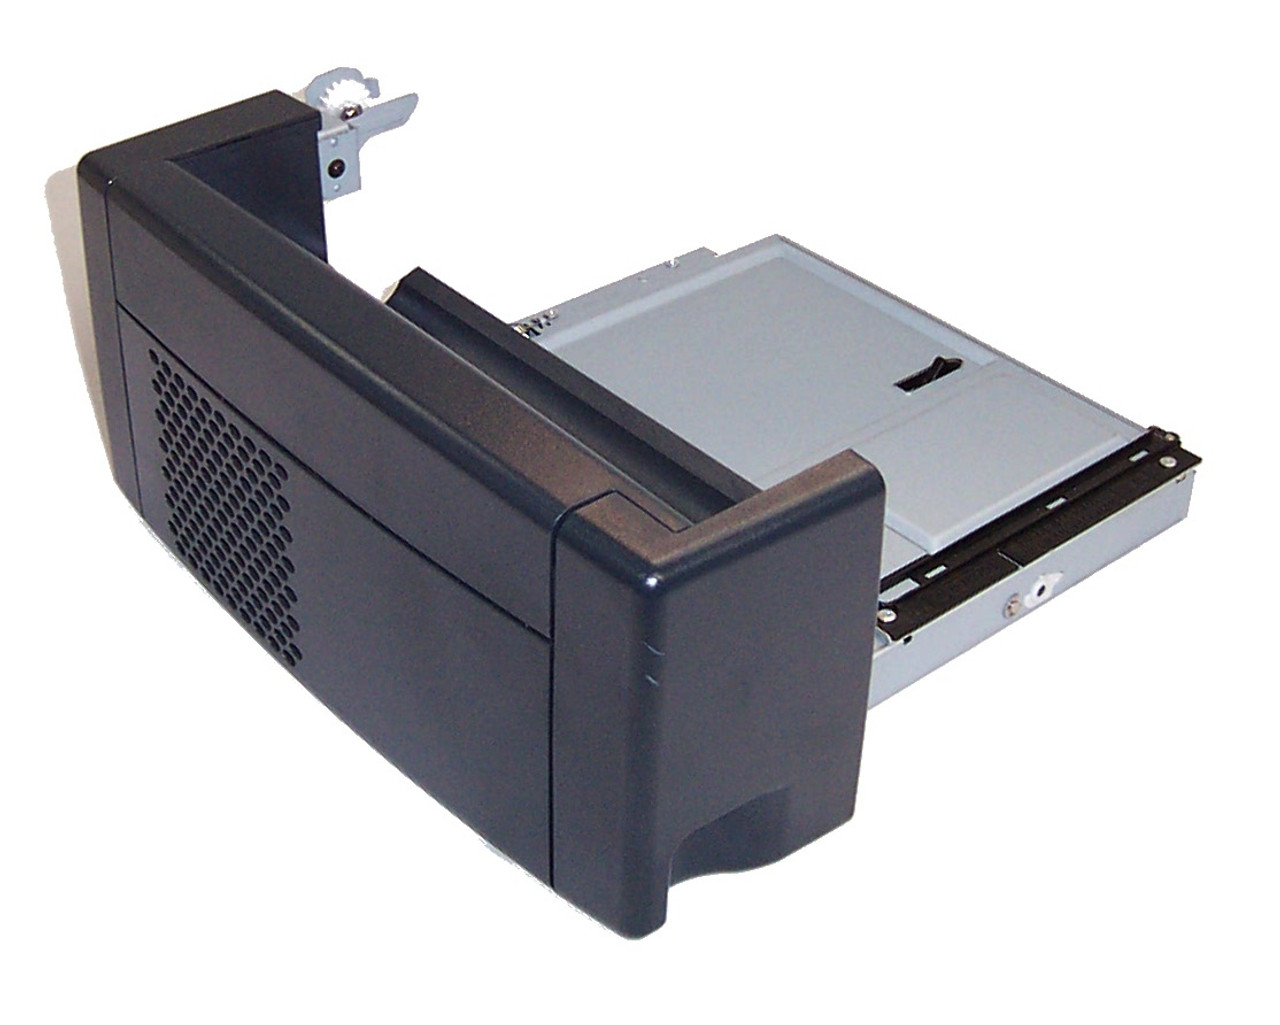 HP LaserJet 600 M601 M602 M603 Duplexer